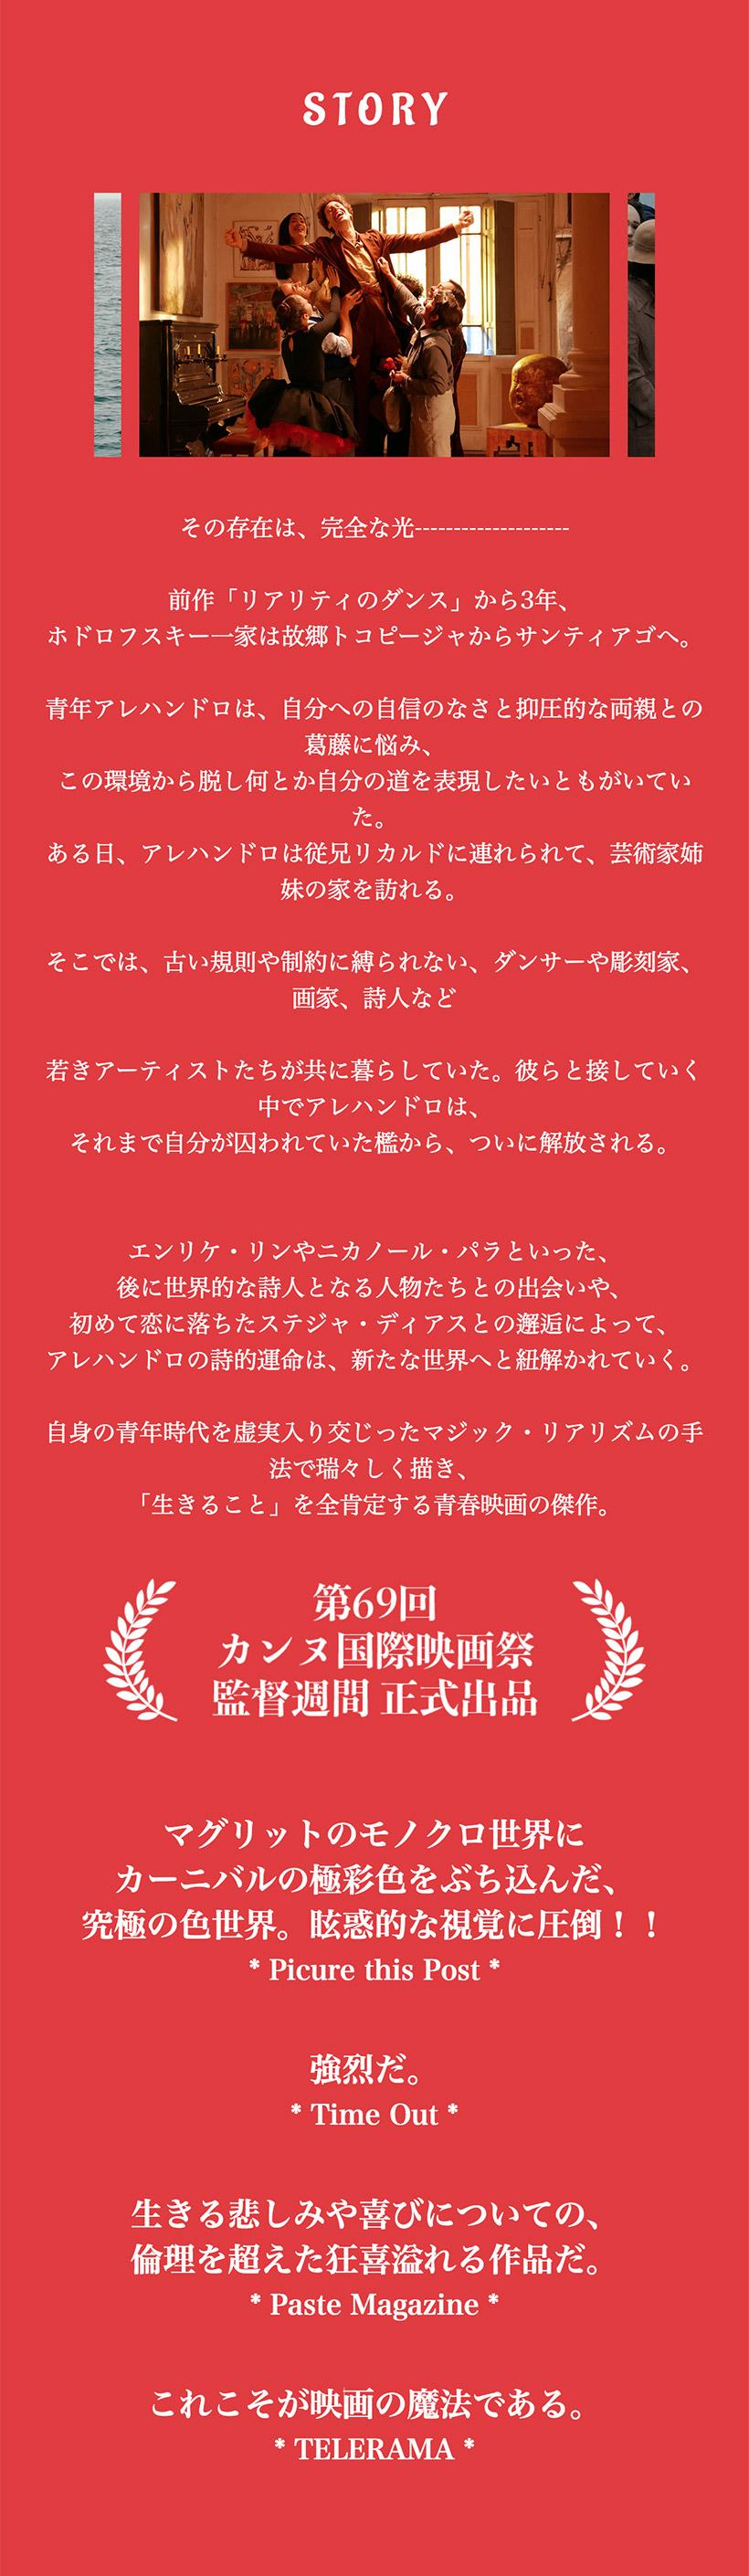 Sister x アレハンドロ・ホドロフスキー監督作品「エンドレス・ポエトリー」